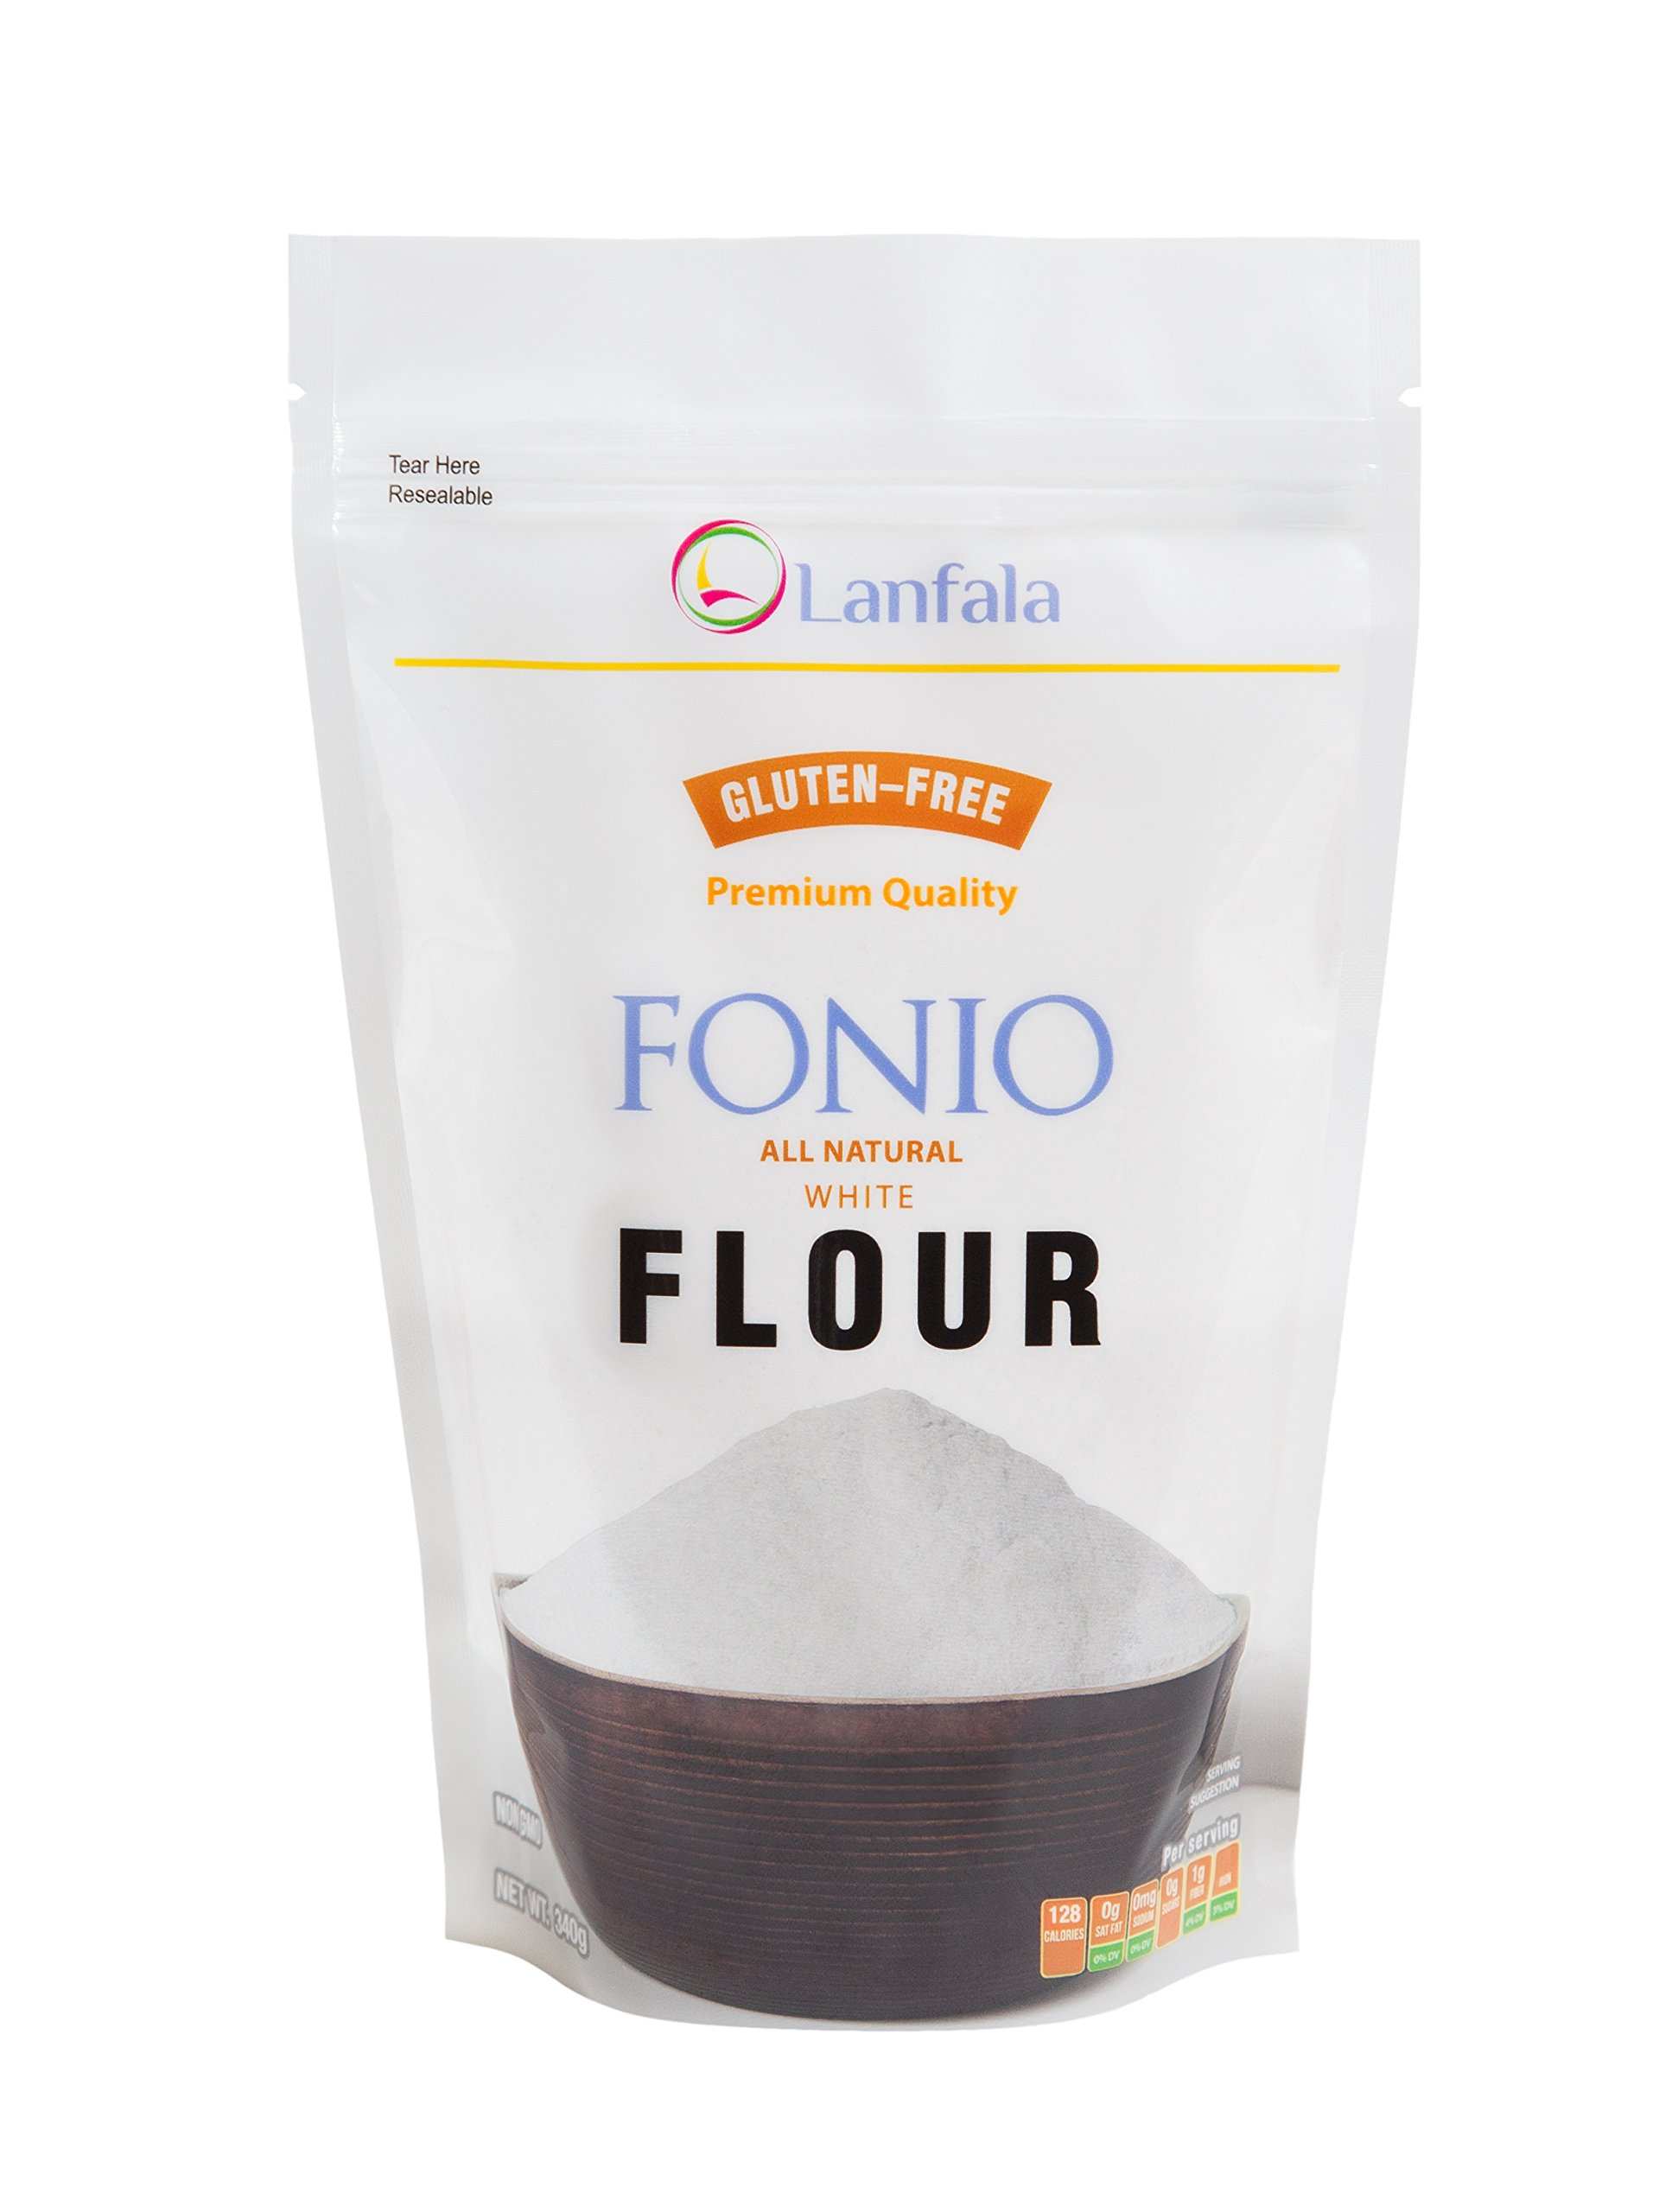 Lanfala Premium Quality 100% All Natural Gluten Free White Fonio Flour by Lanfala